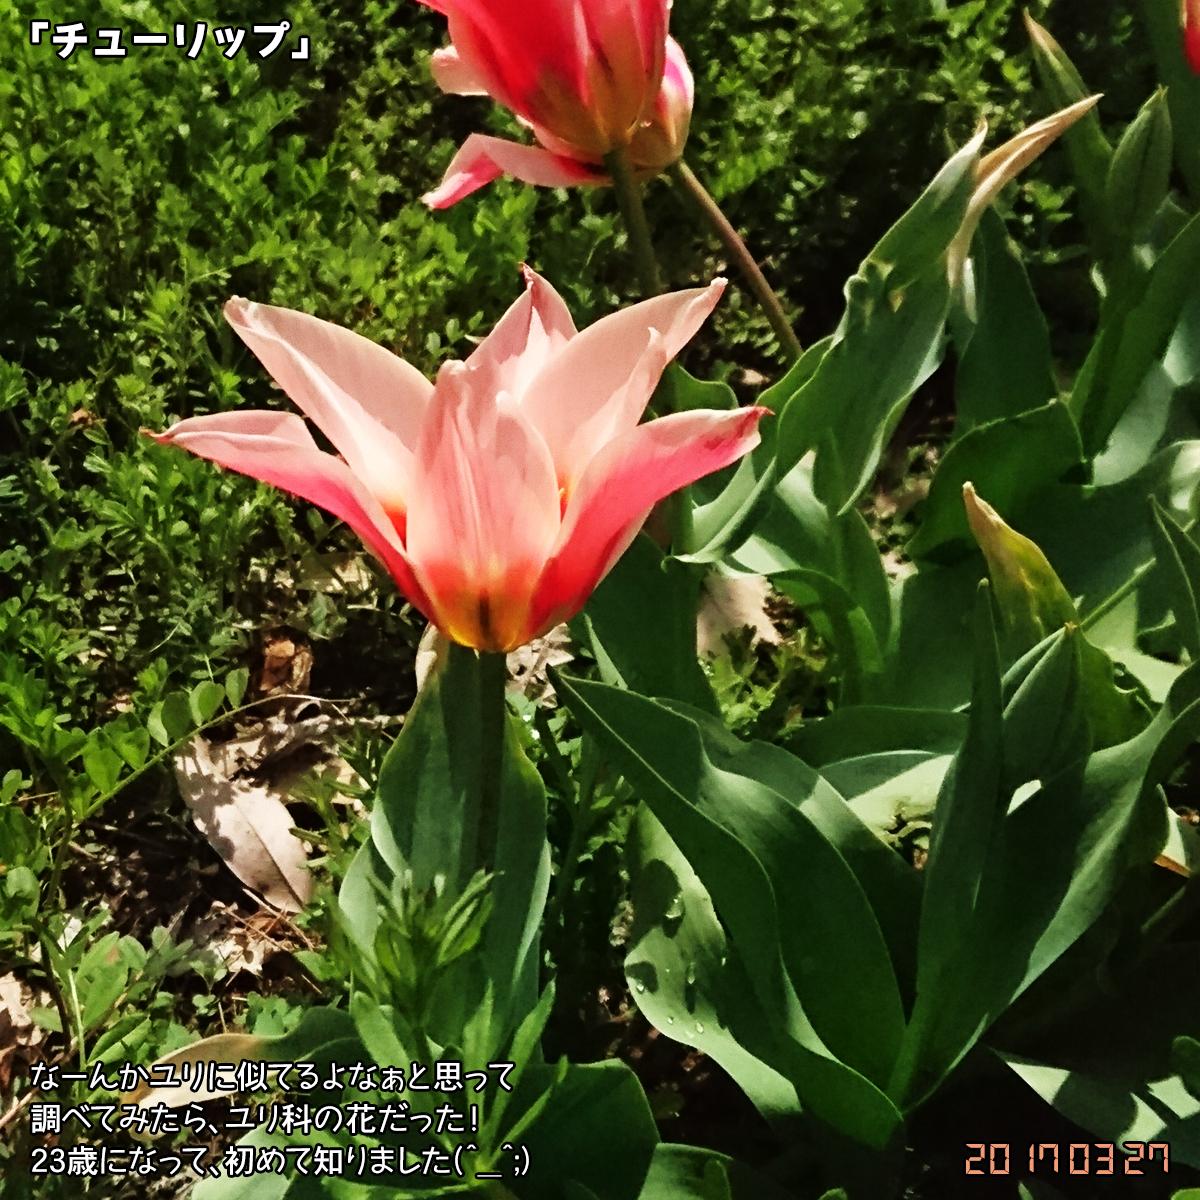 DSC_2120_1.jpg